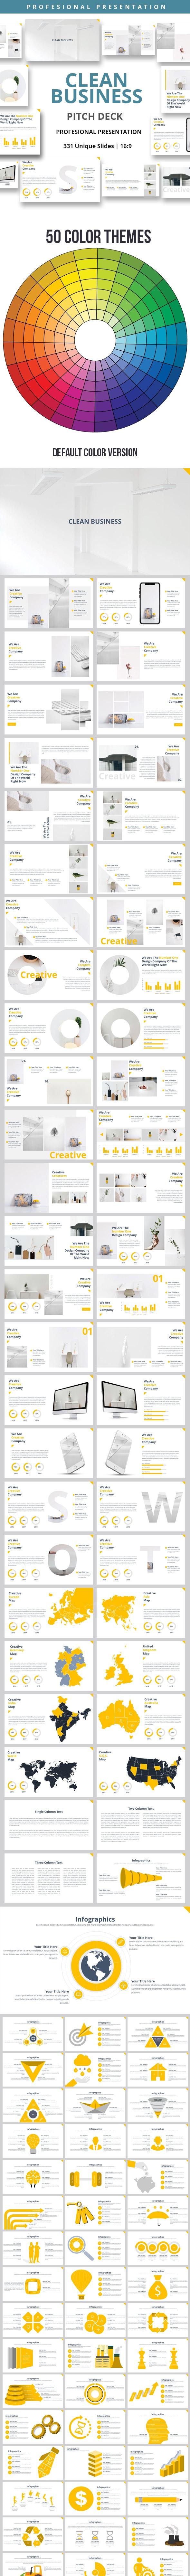 Clean Business Powerpoint Presentation Template - Business PowerPoint Templates